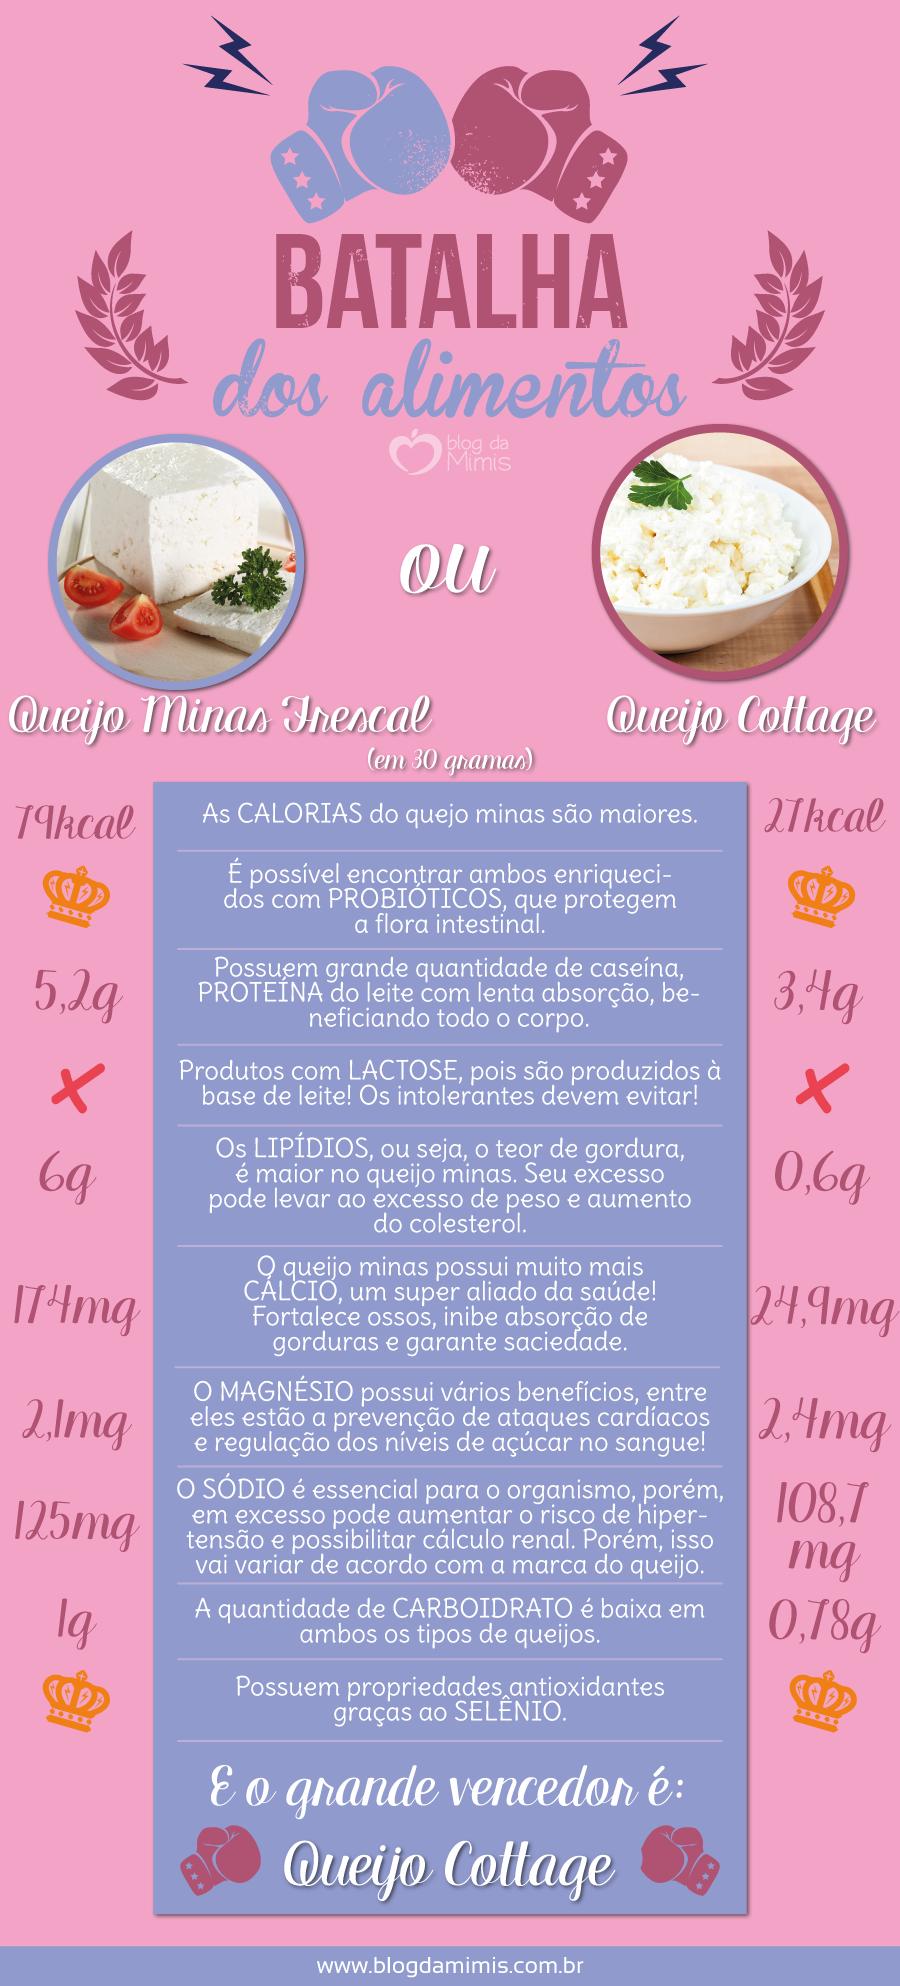 batalha-queijo-minas-cottage-blog-da-mimis-michelle-franzoni-post